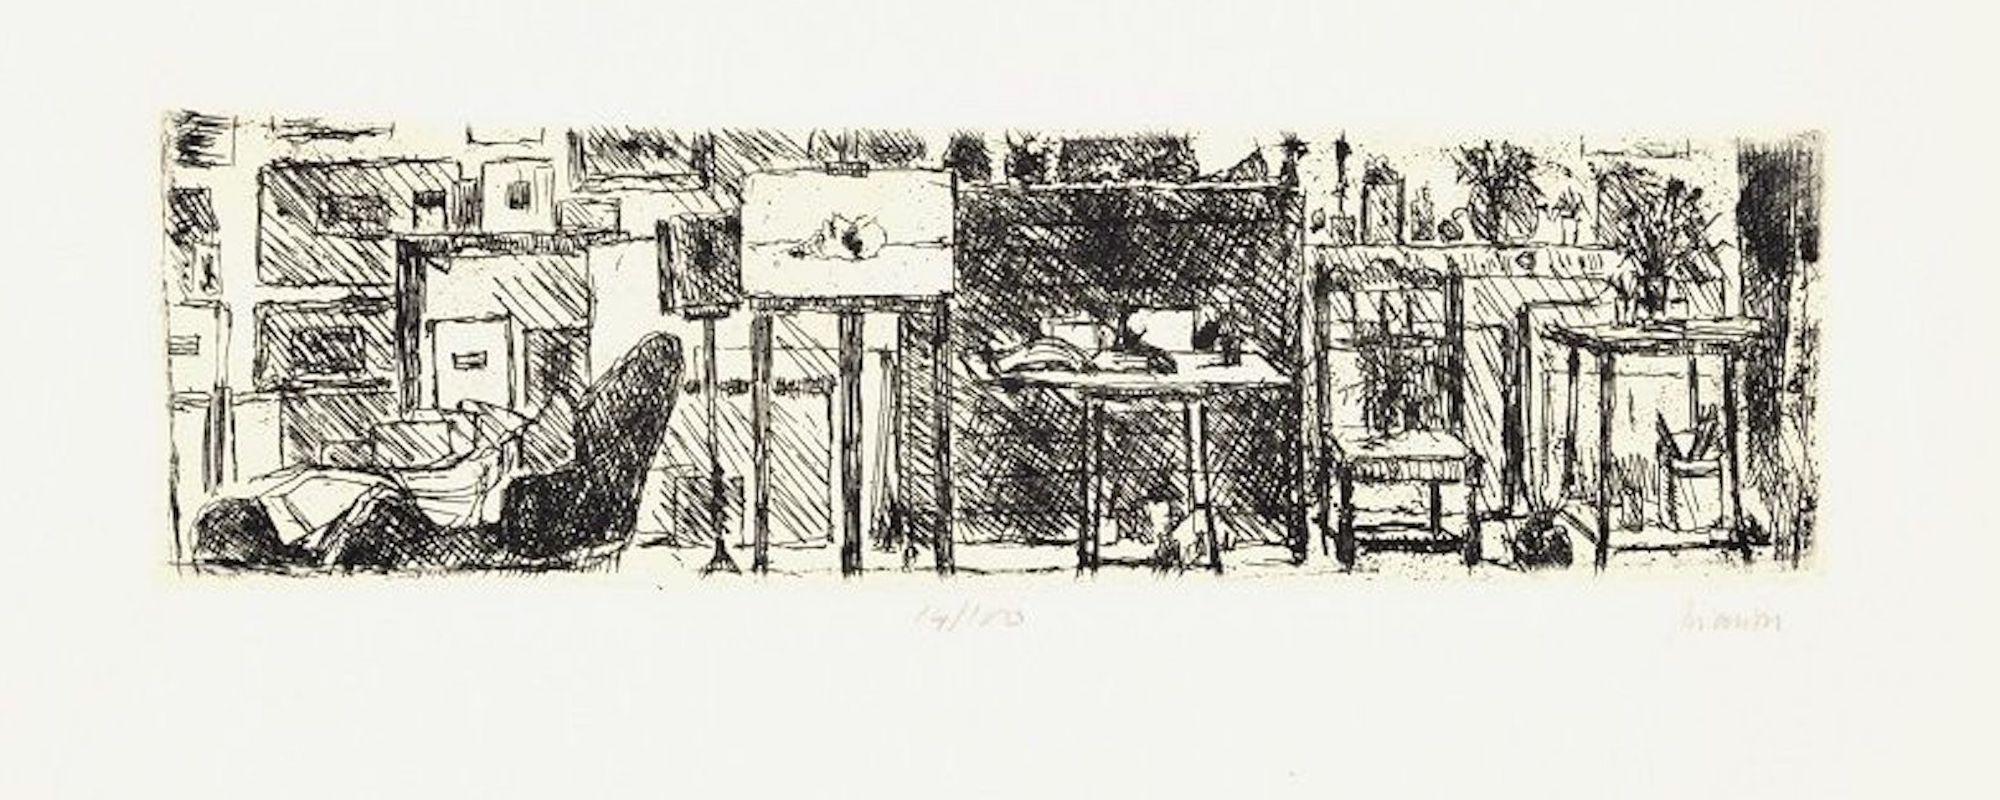 The Artist's Studio - Original Etching by Renzo Biasion - 1960s